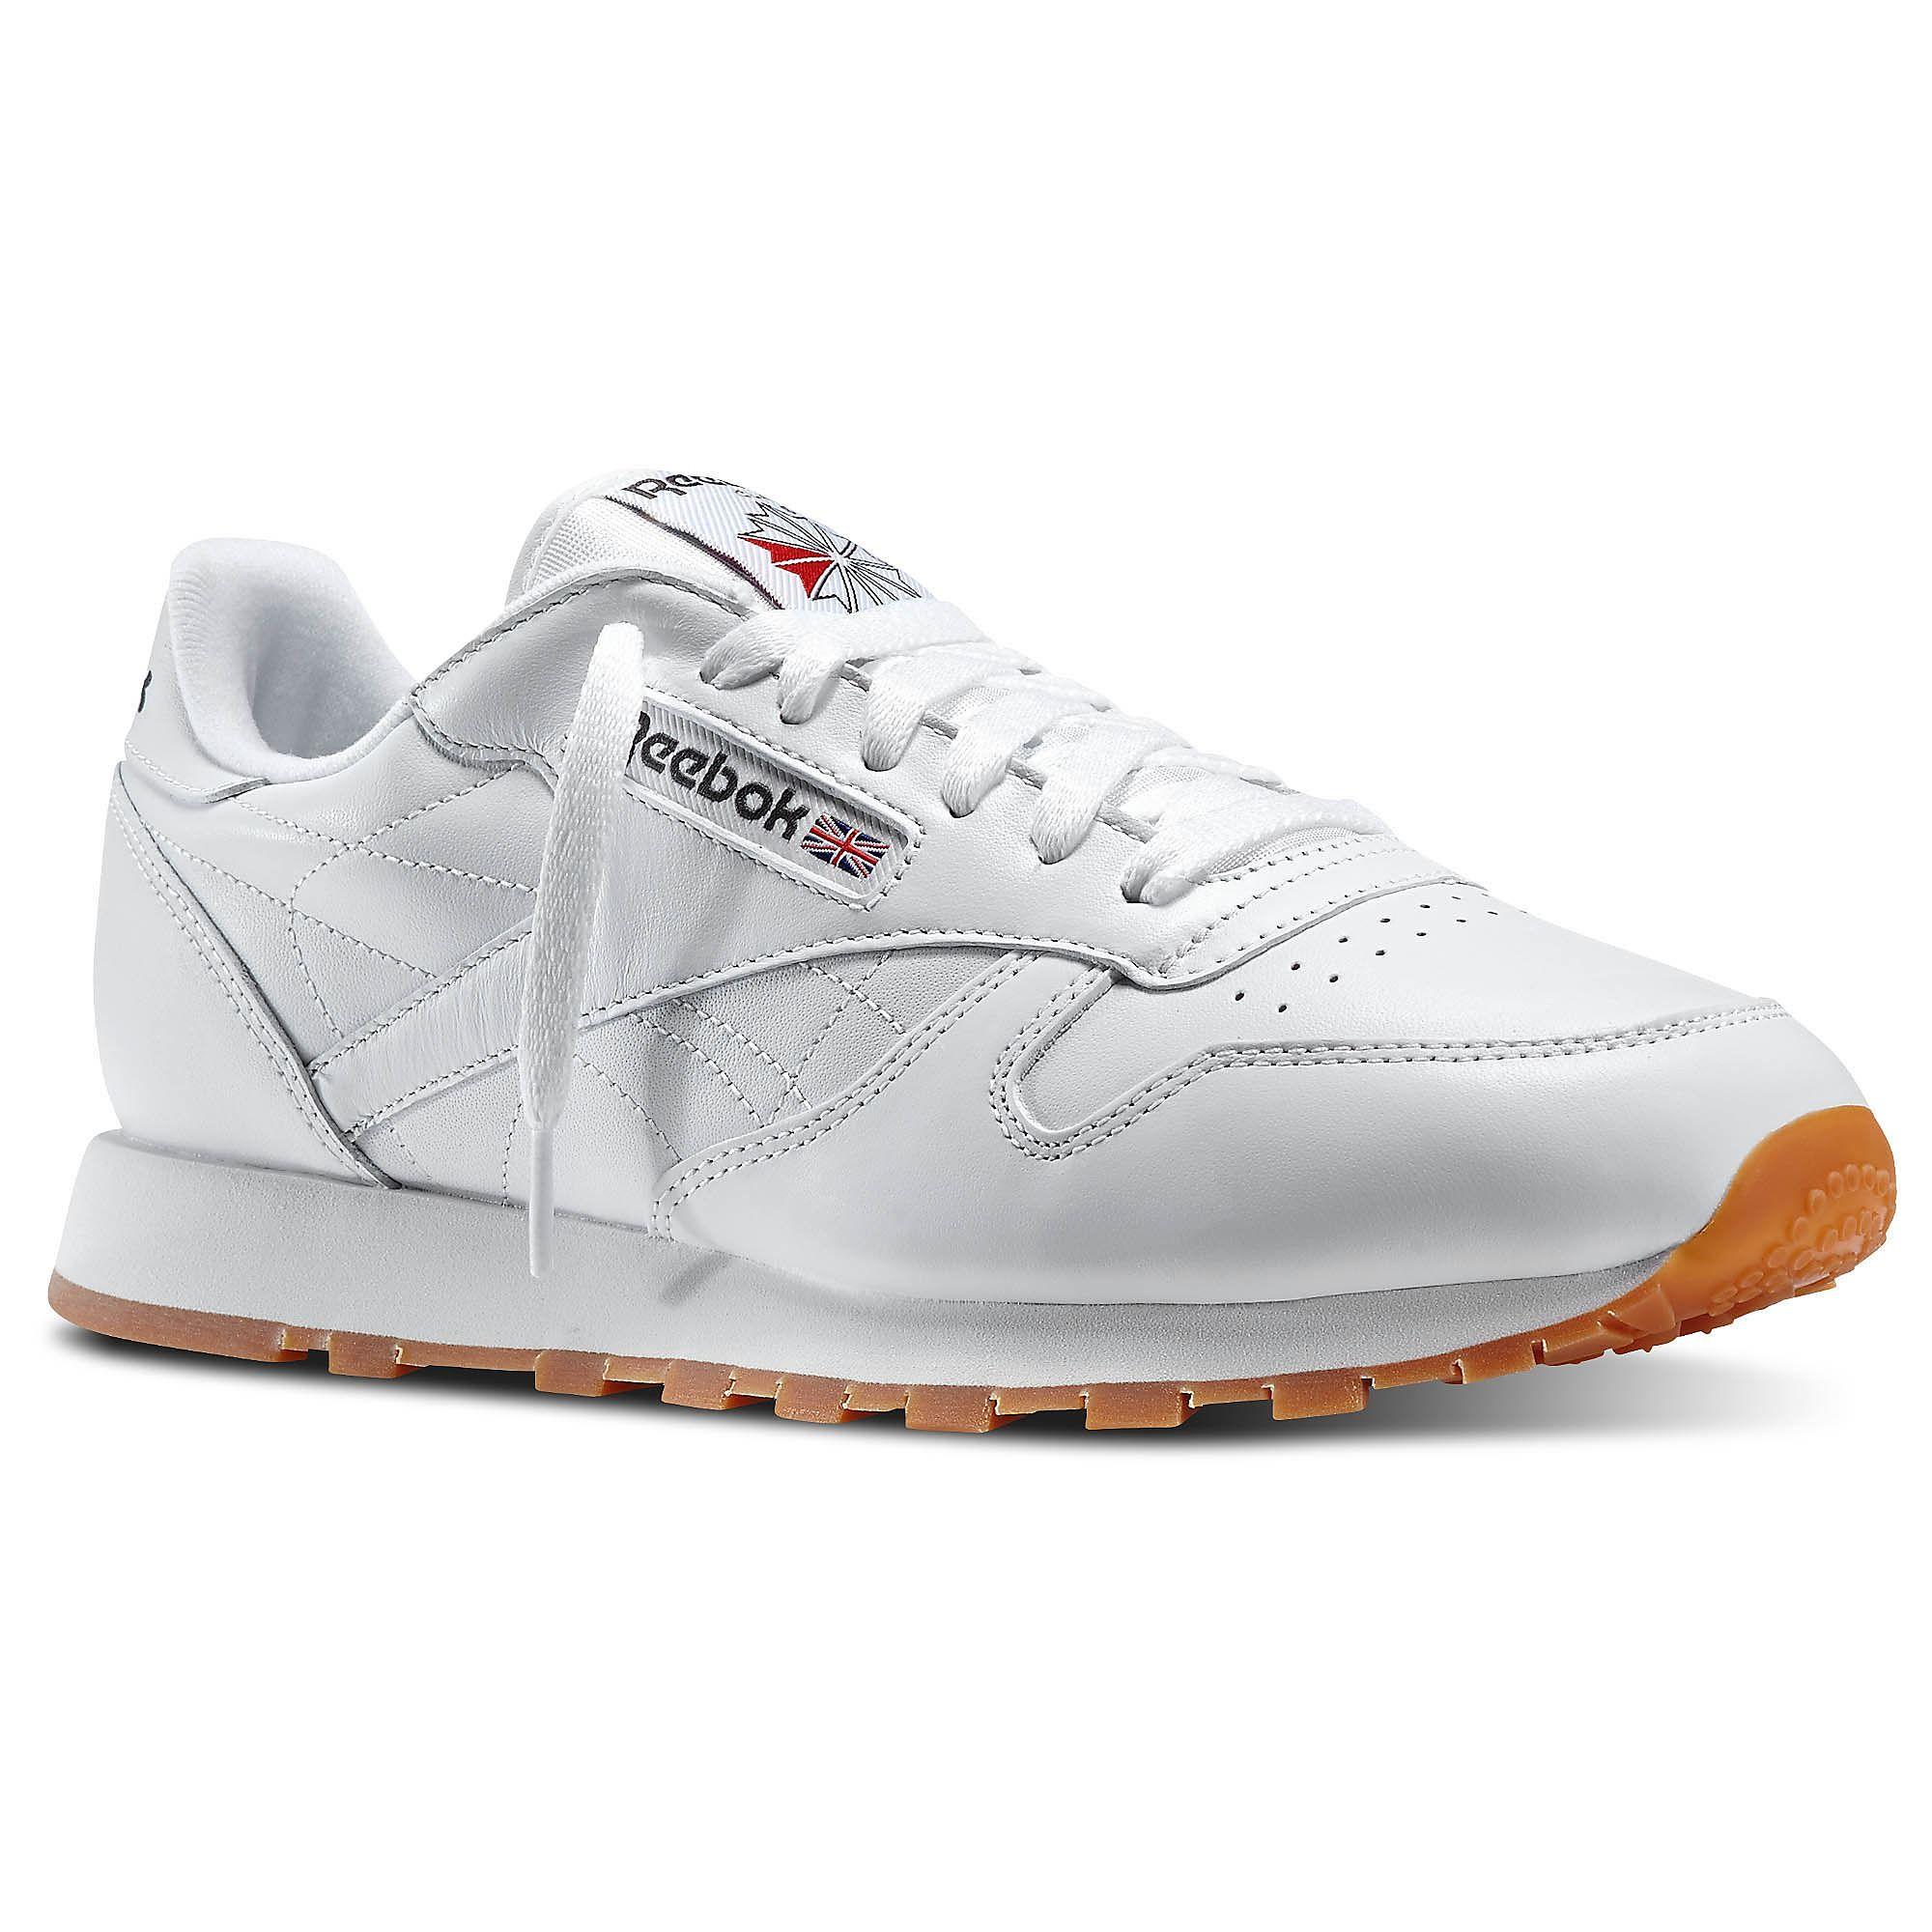 pablo escobar reebok shoes